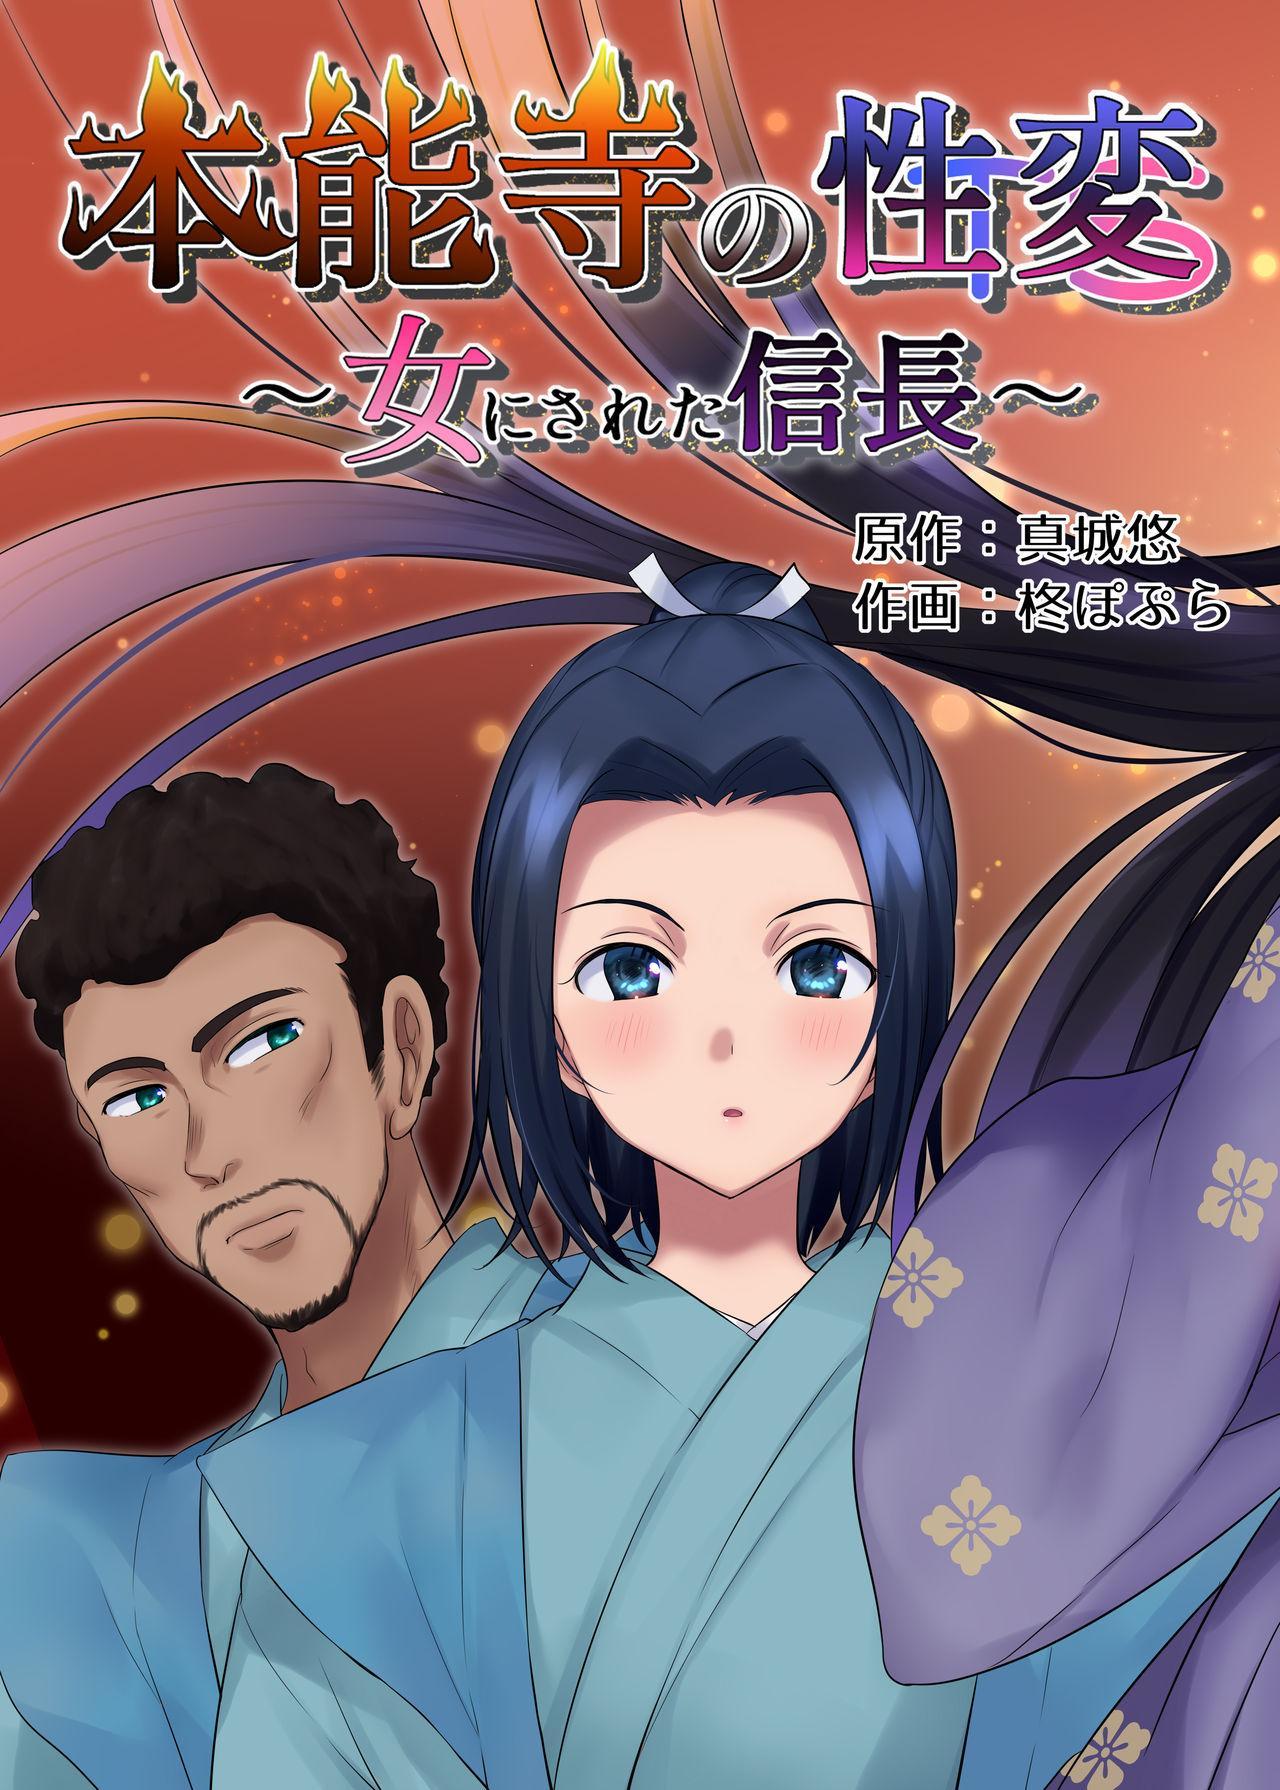 Nobunaga who was made a sexual change woman of Honnoji 4